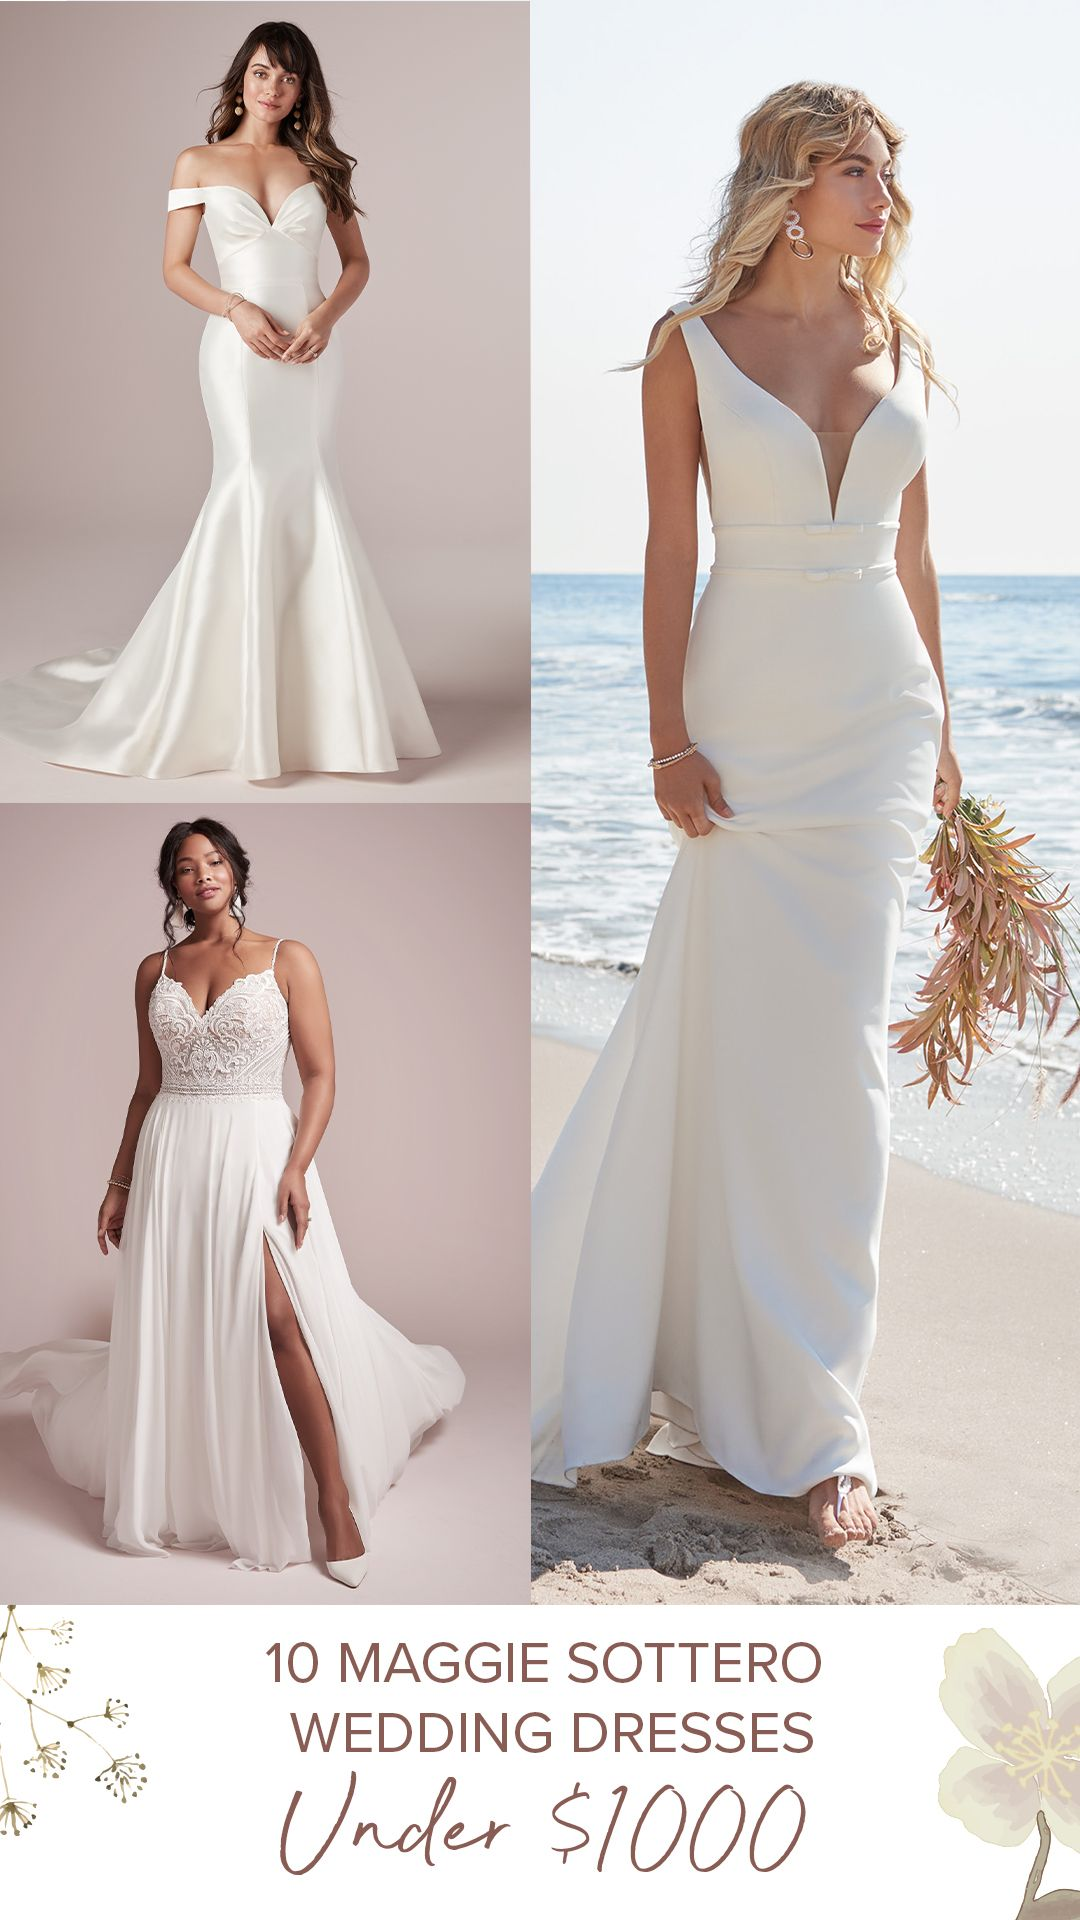 Maggie Sottero Veronica Wedding Dress Used Size 8 630 Modest Wedding Dresses Designer Wedding Dresses Elegant Wedding Dress